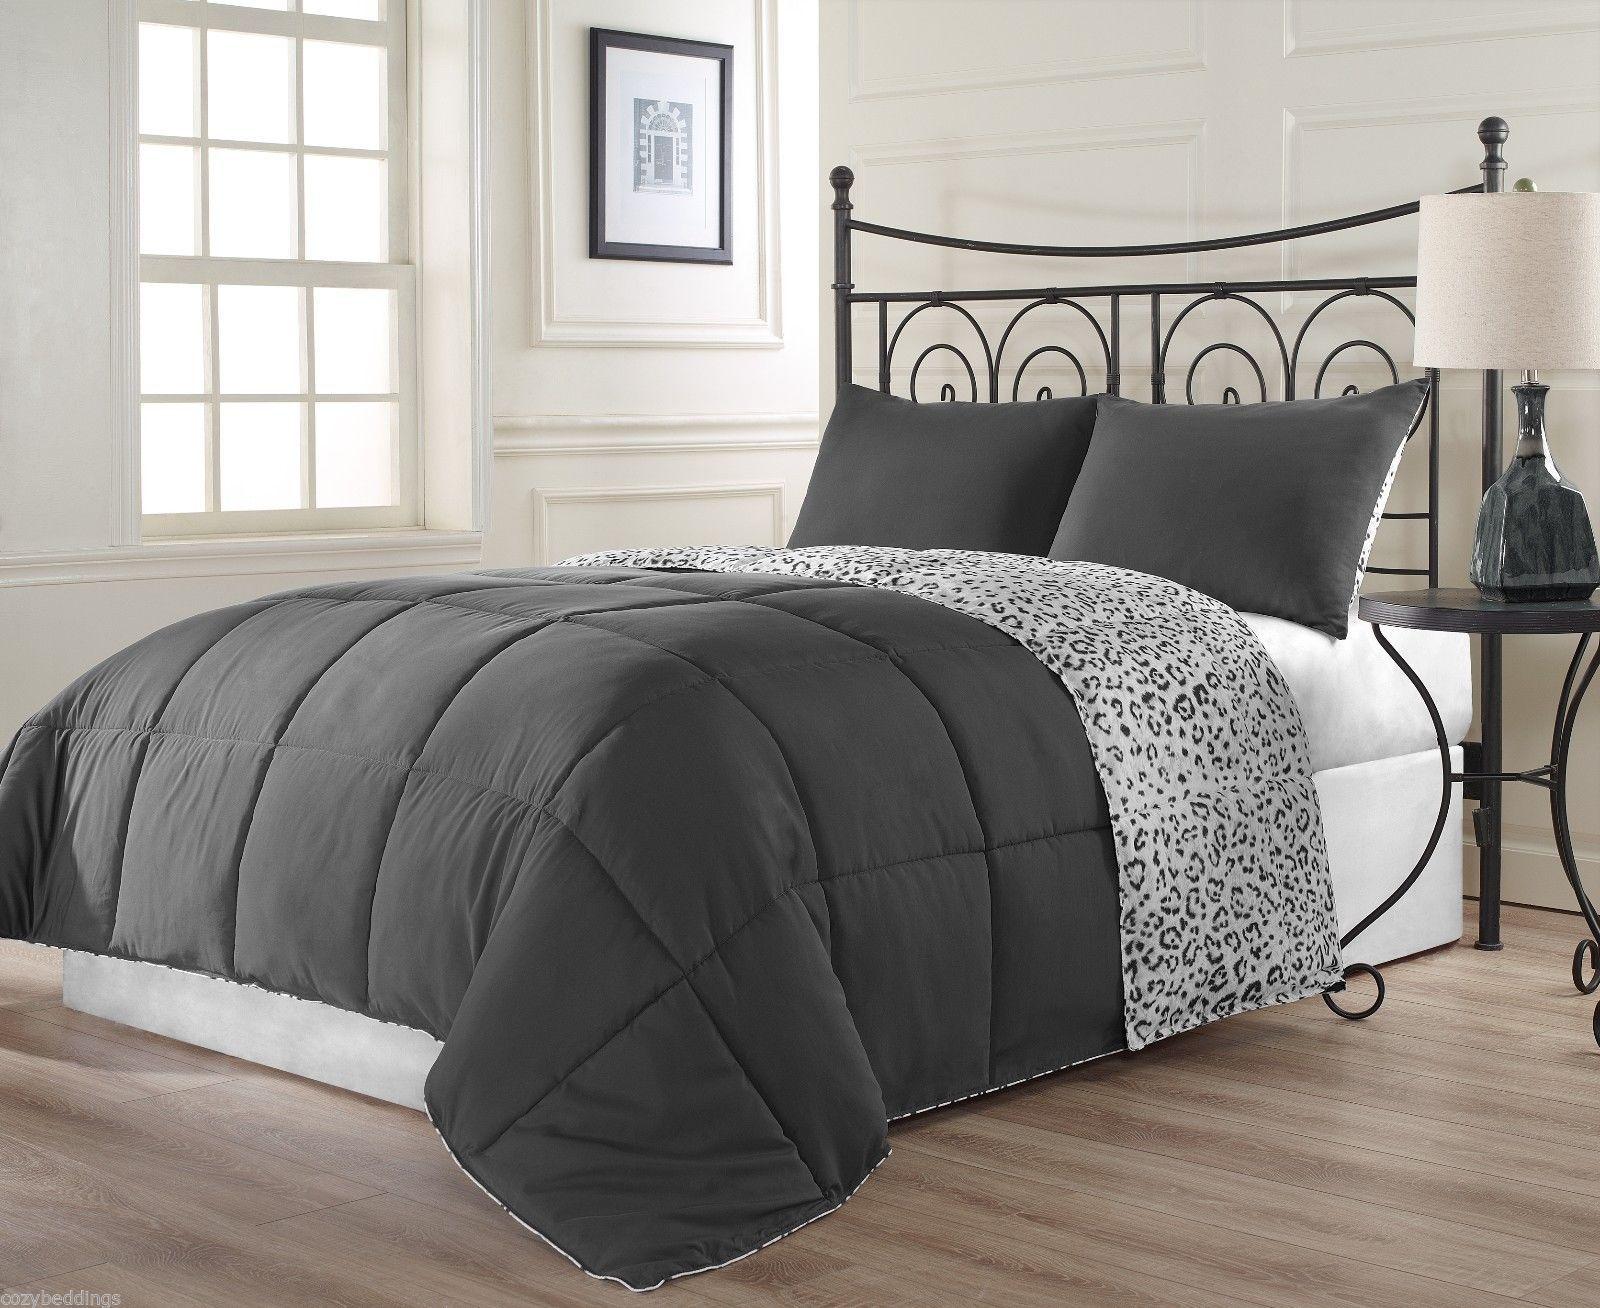 snow leopard twin size bed 3pc reversible charcoal grey white comforter set comforters sets. Black Bedroom Furniture Sets. Home Design Ideas